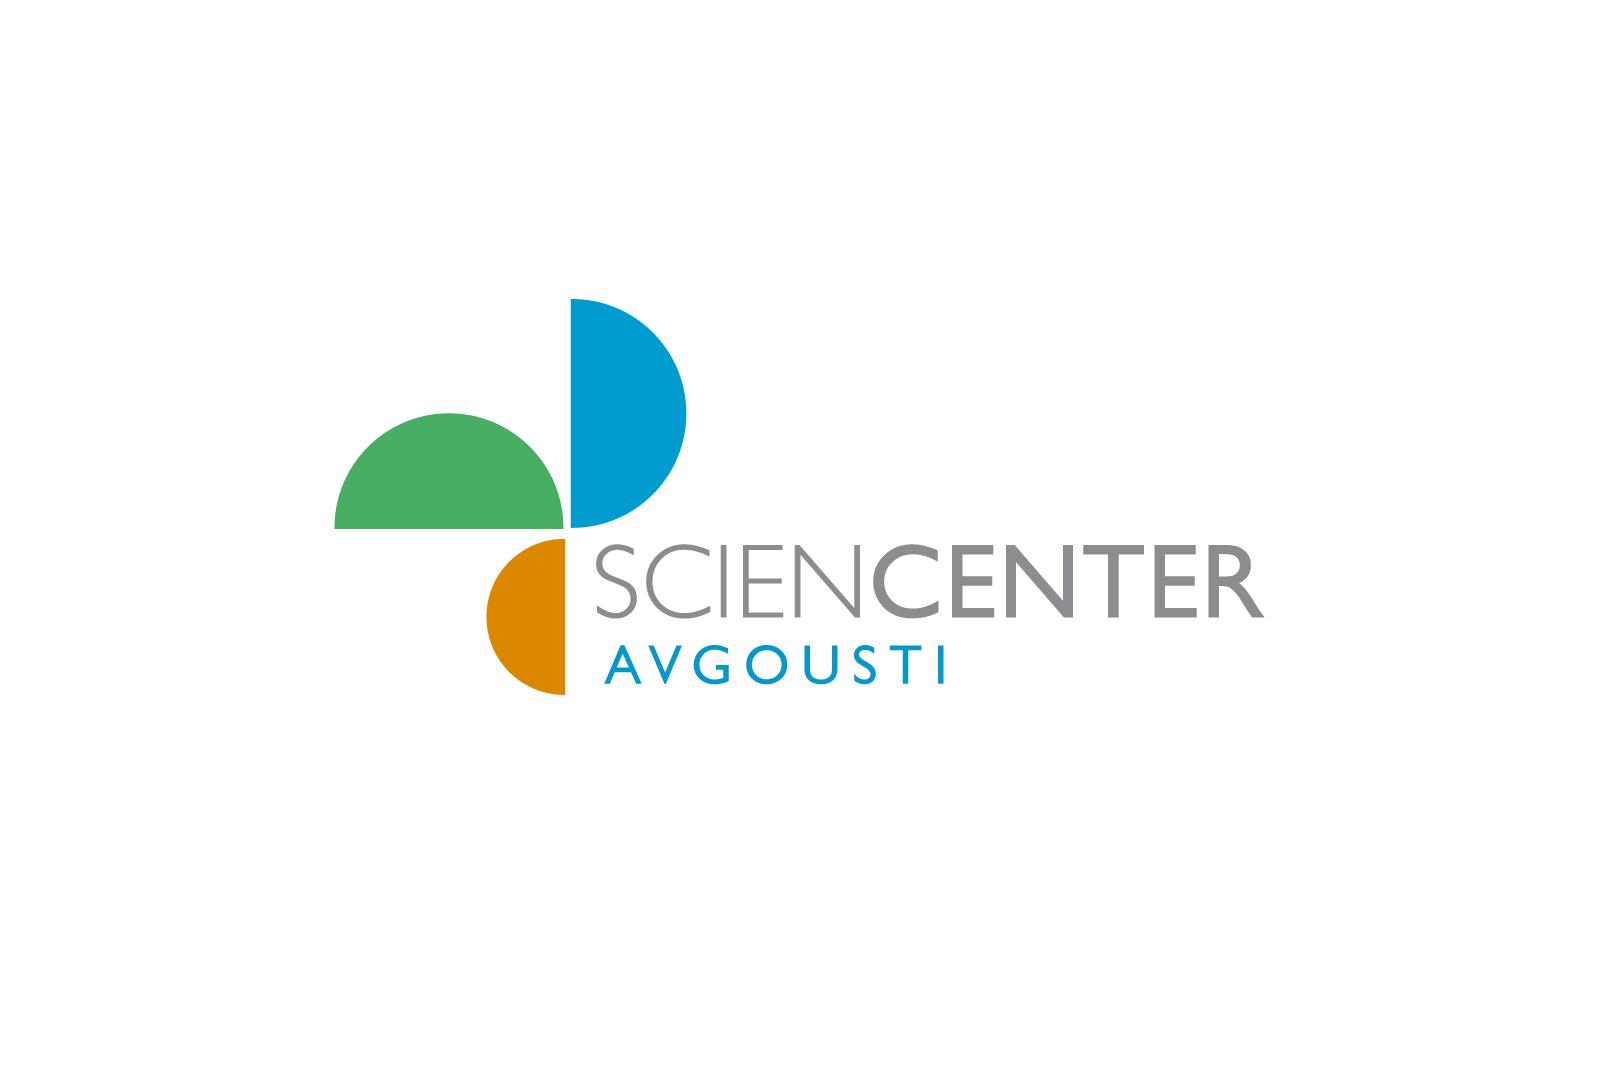 sciencenter_logo.png